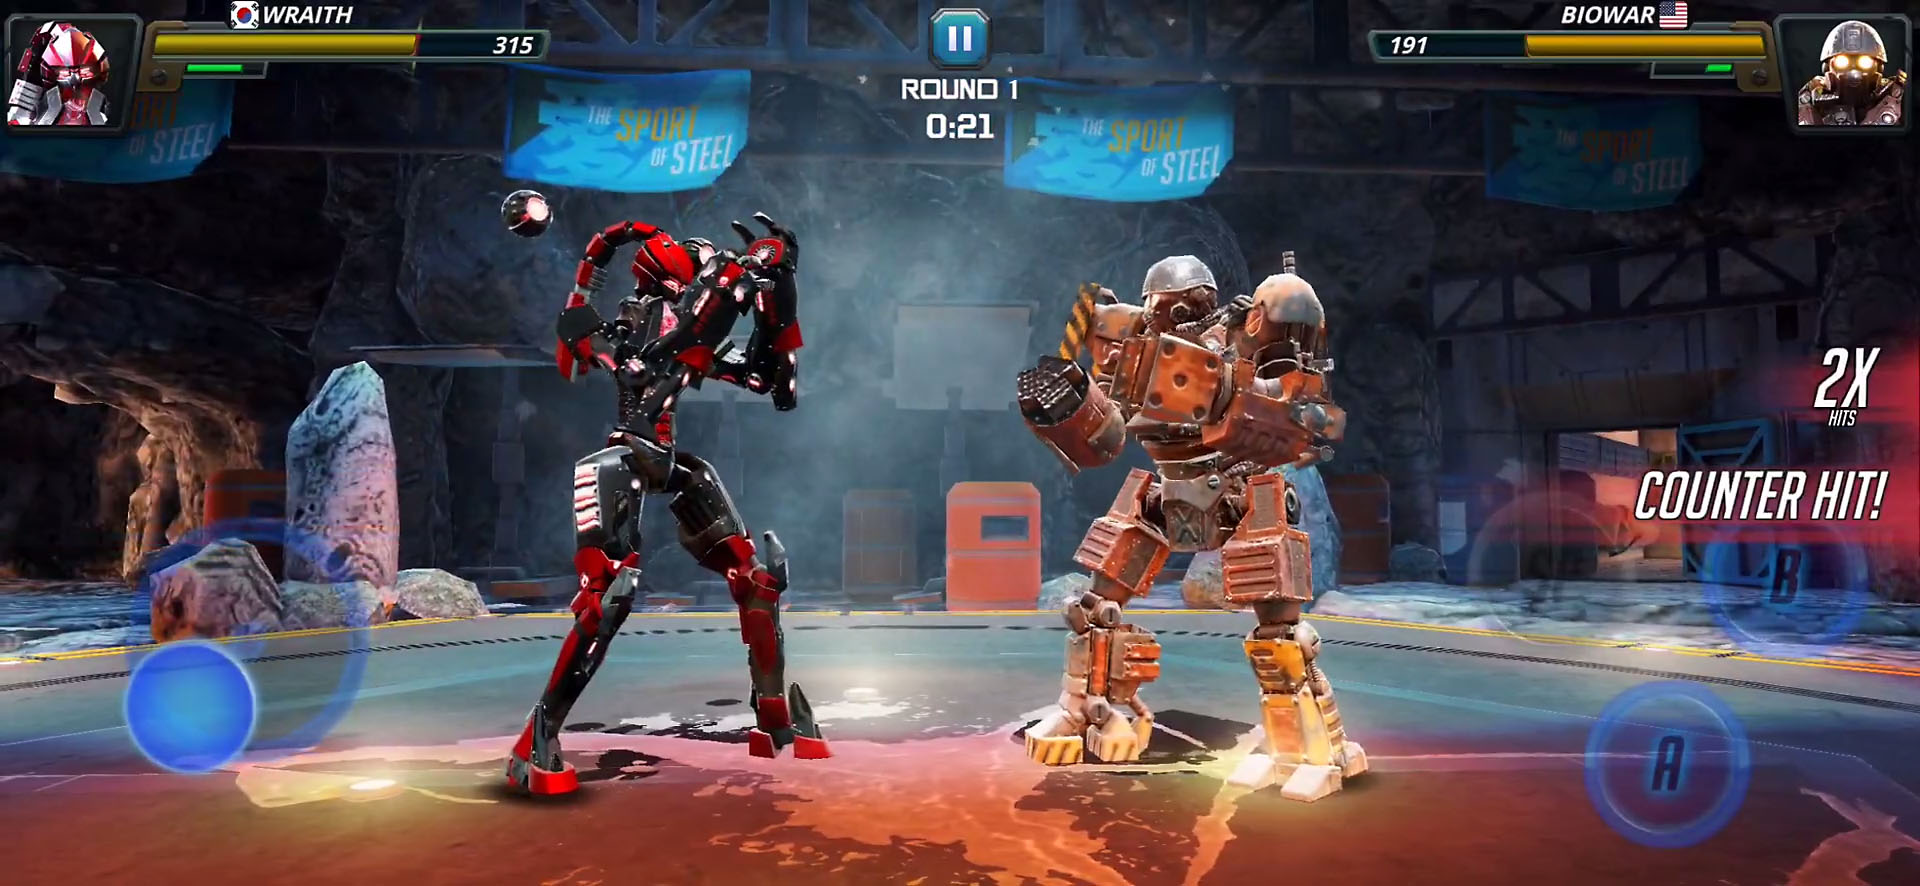 World Robot Boxing 2 скріншот 1